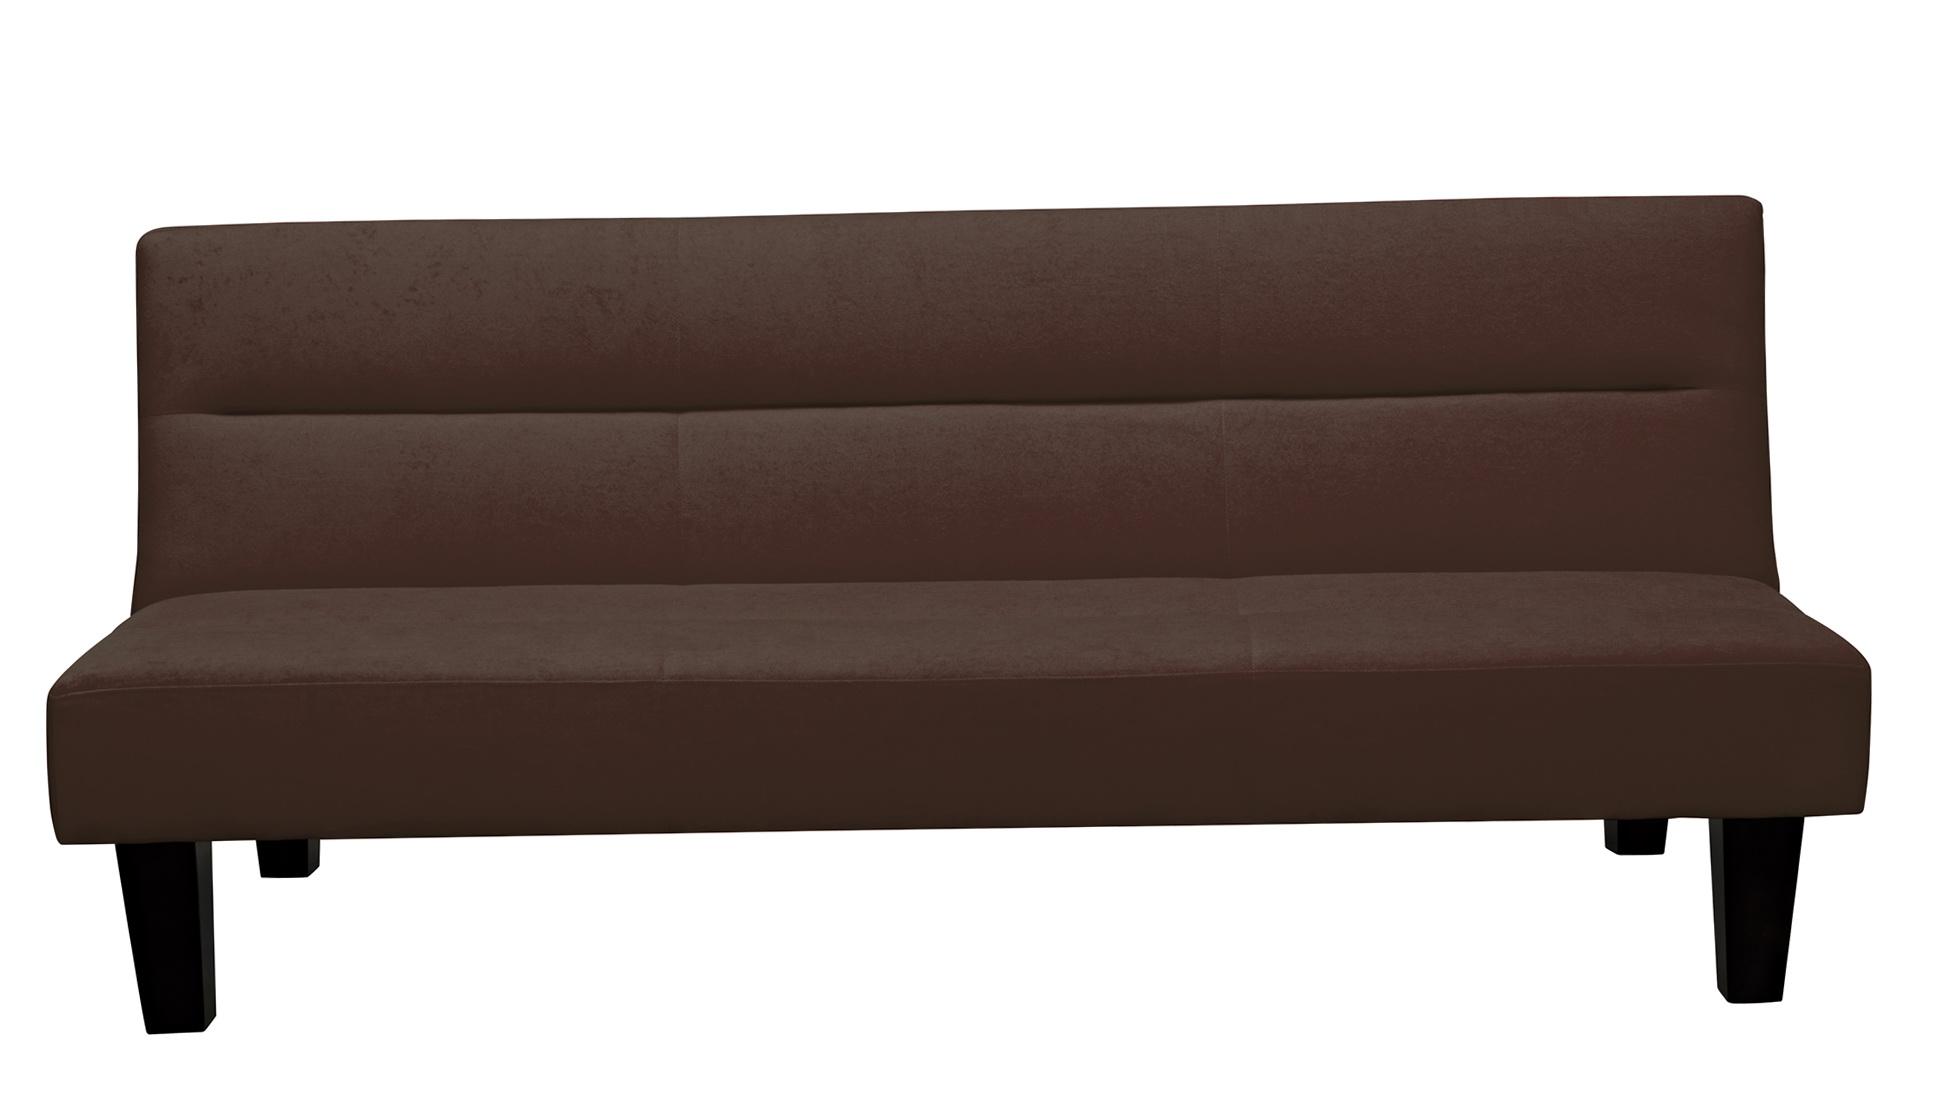 Kebo Futon Sofa Bed Weight Limit